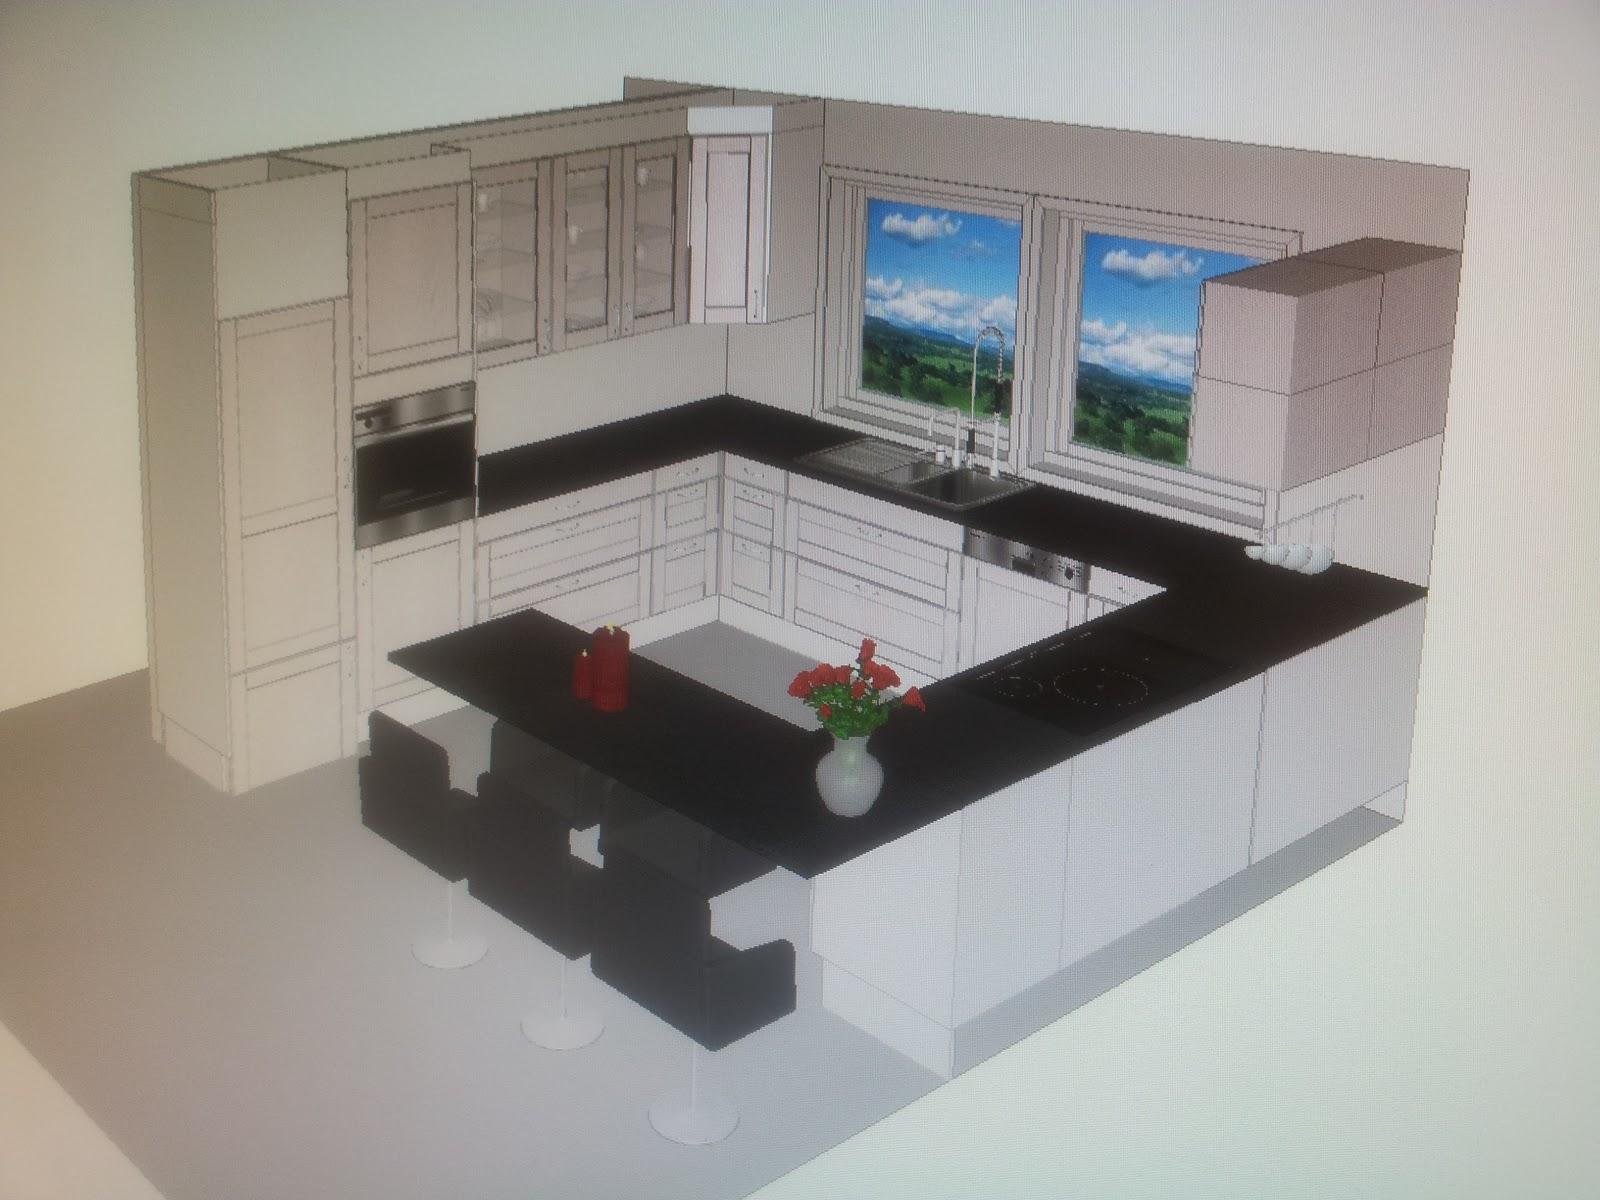 Skoleblogg : teknisk design dak 2d/3d: oktober 2012